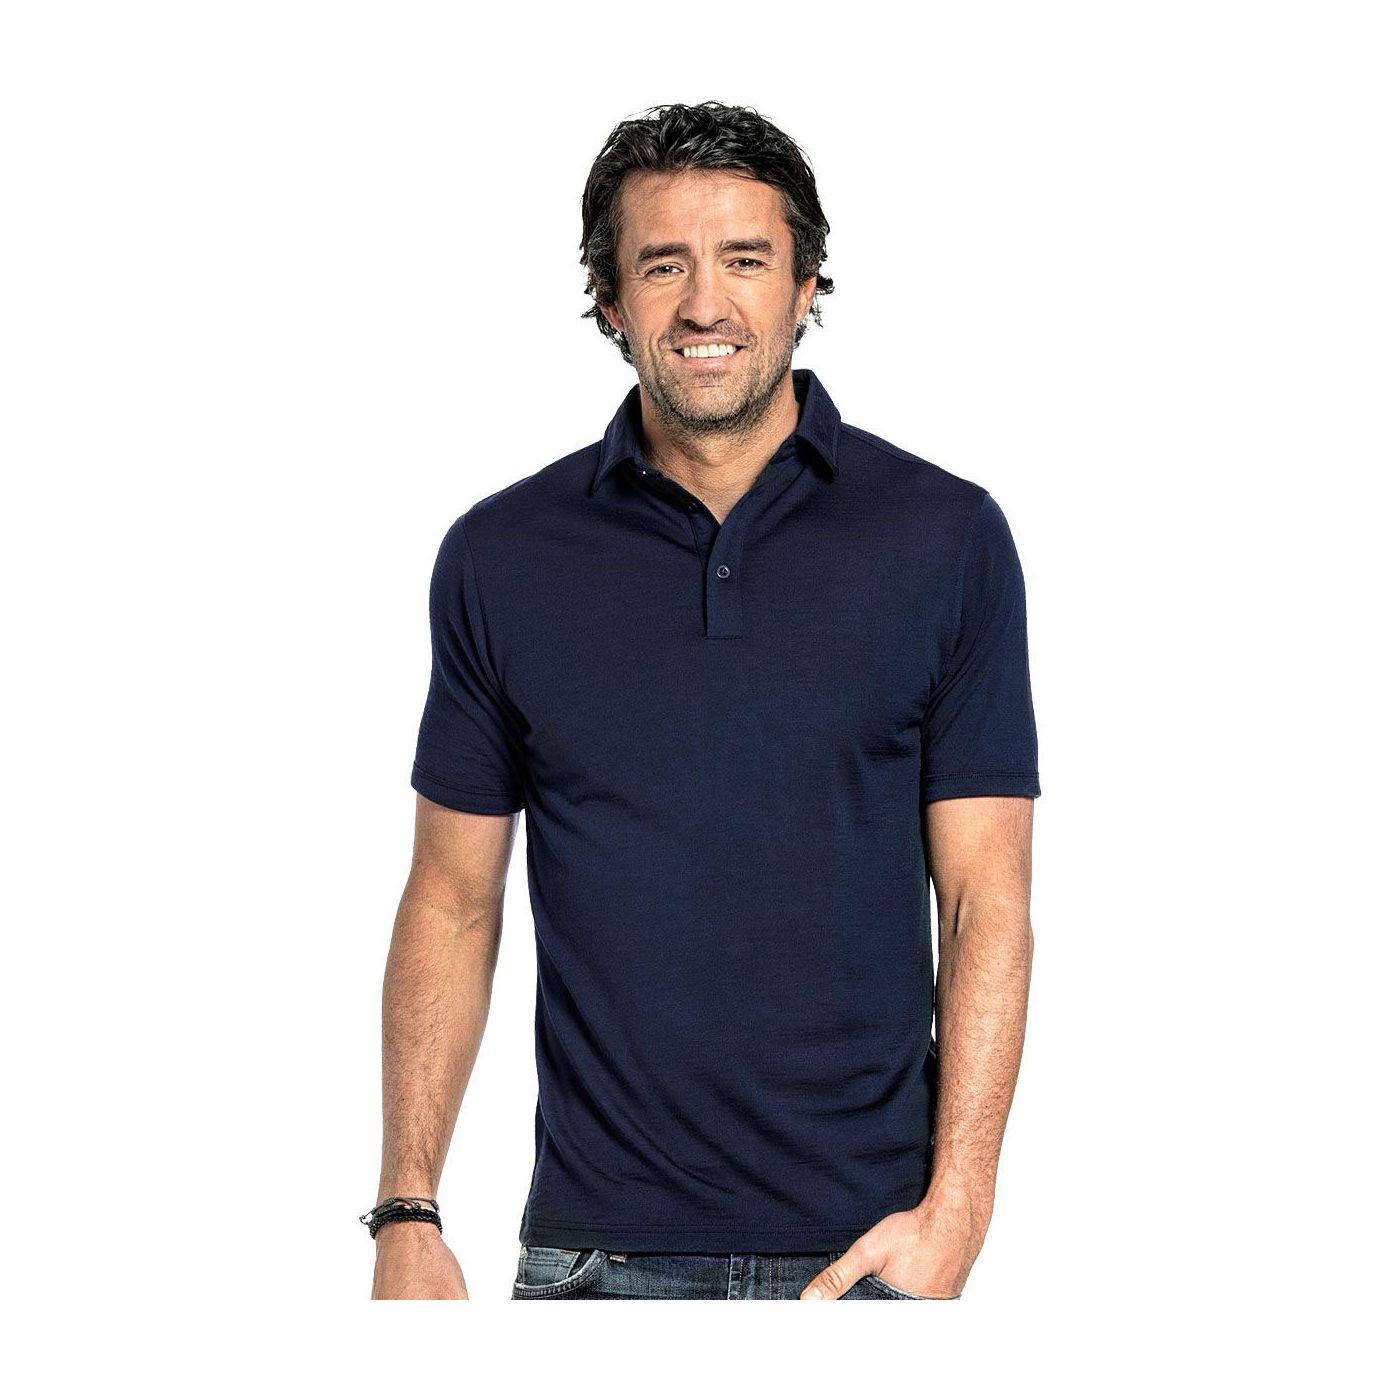 Shirt Polo Short Sleeve Navy Blue